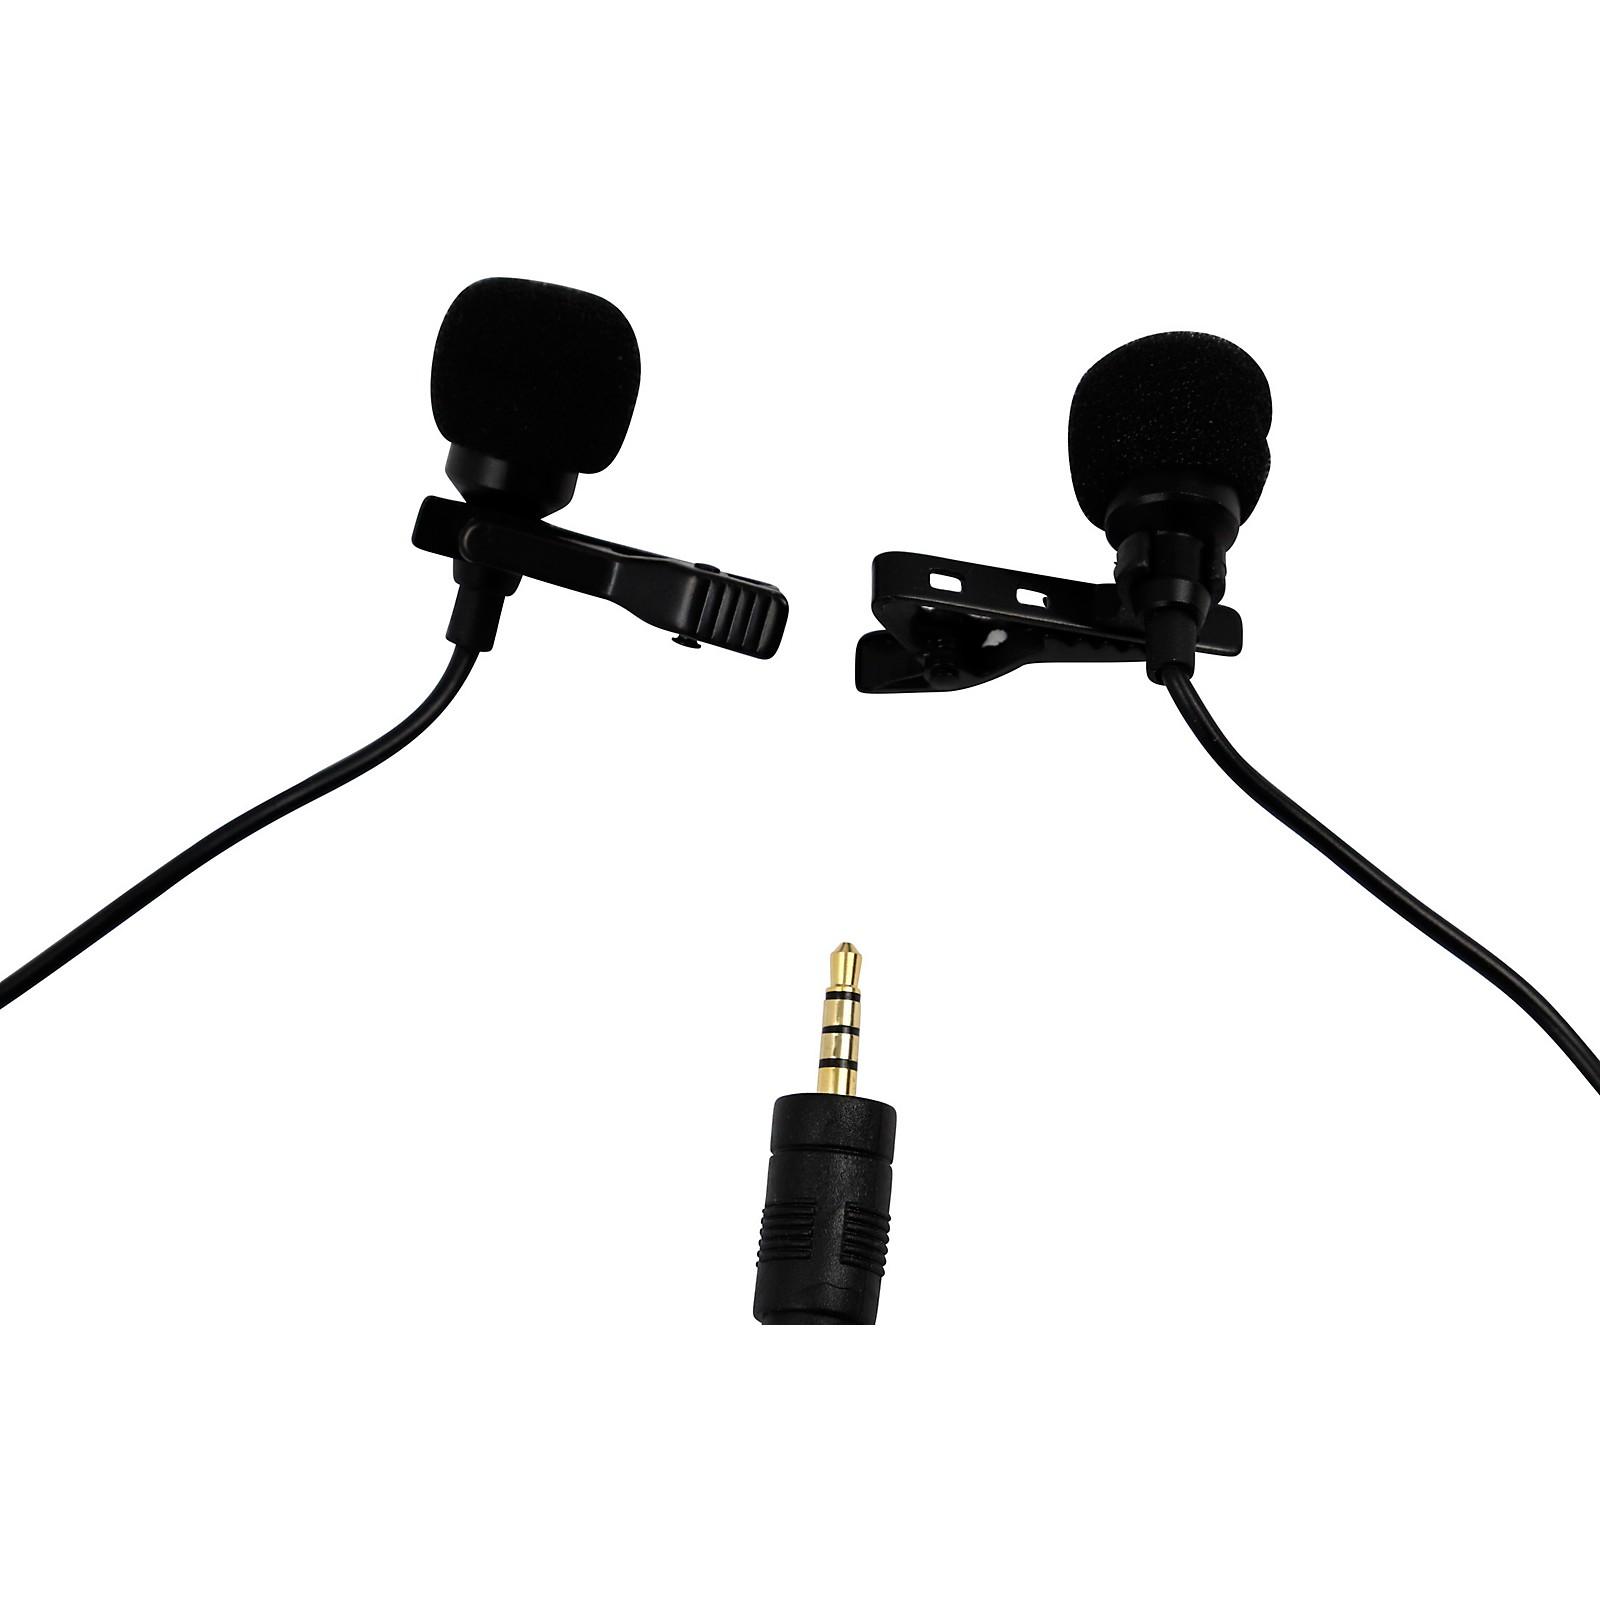 BK Media PV550-C Dual-Head Lavalier Microphone